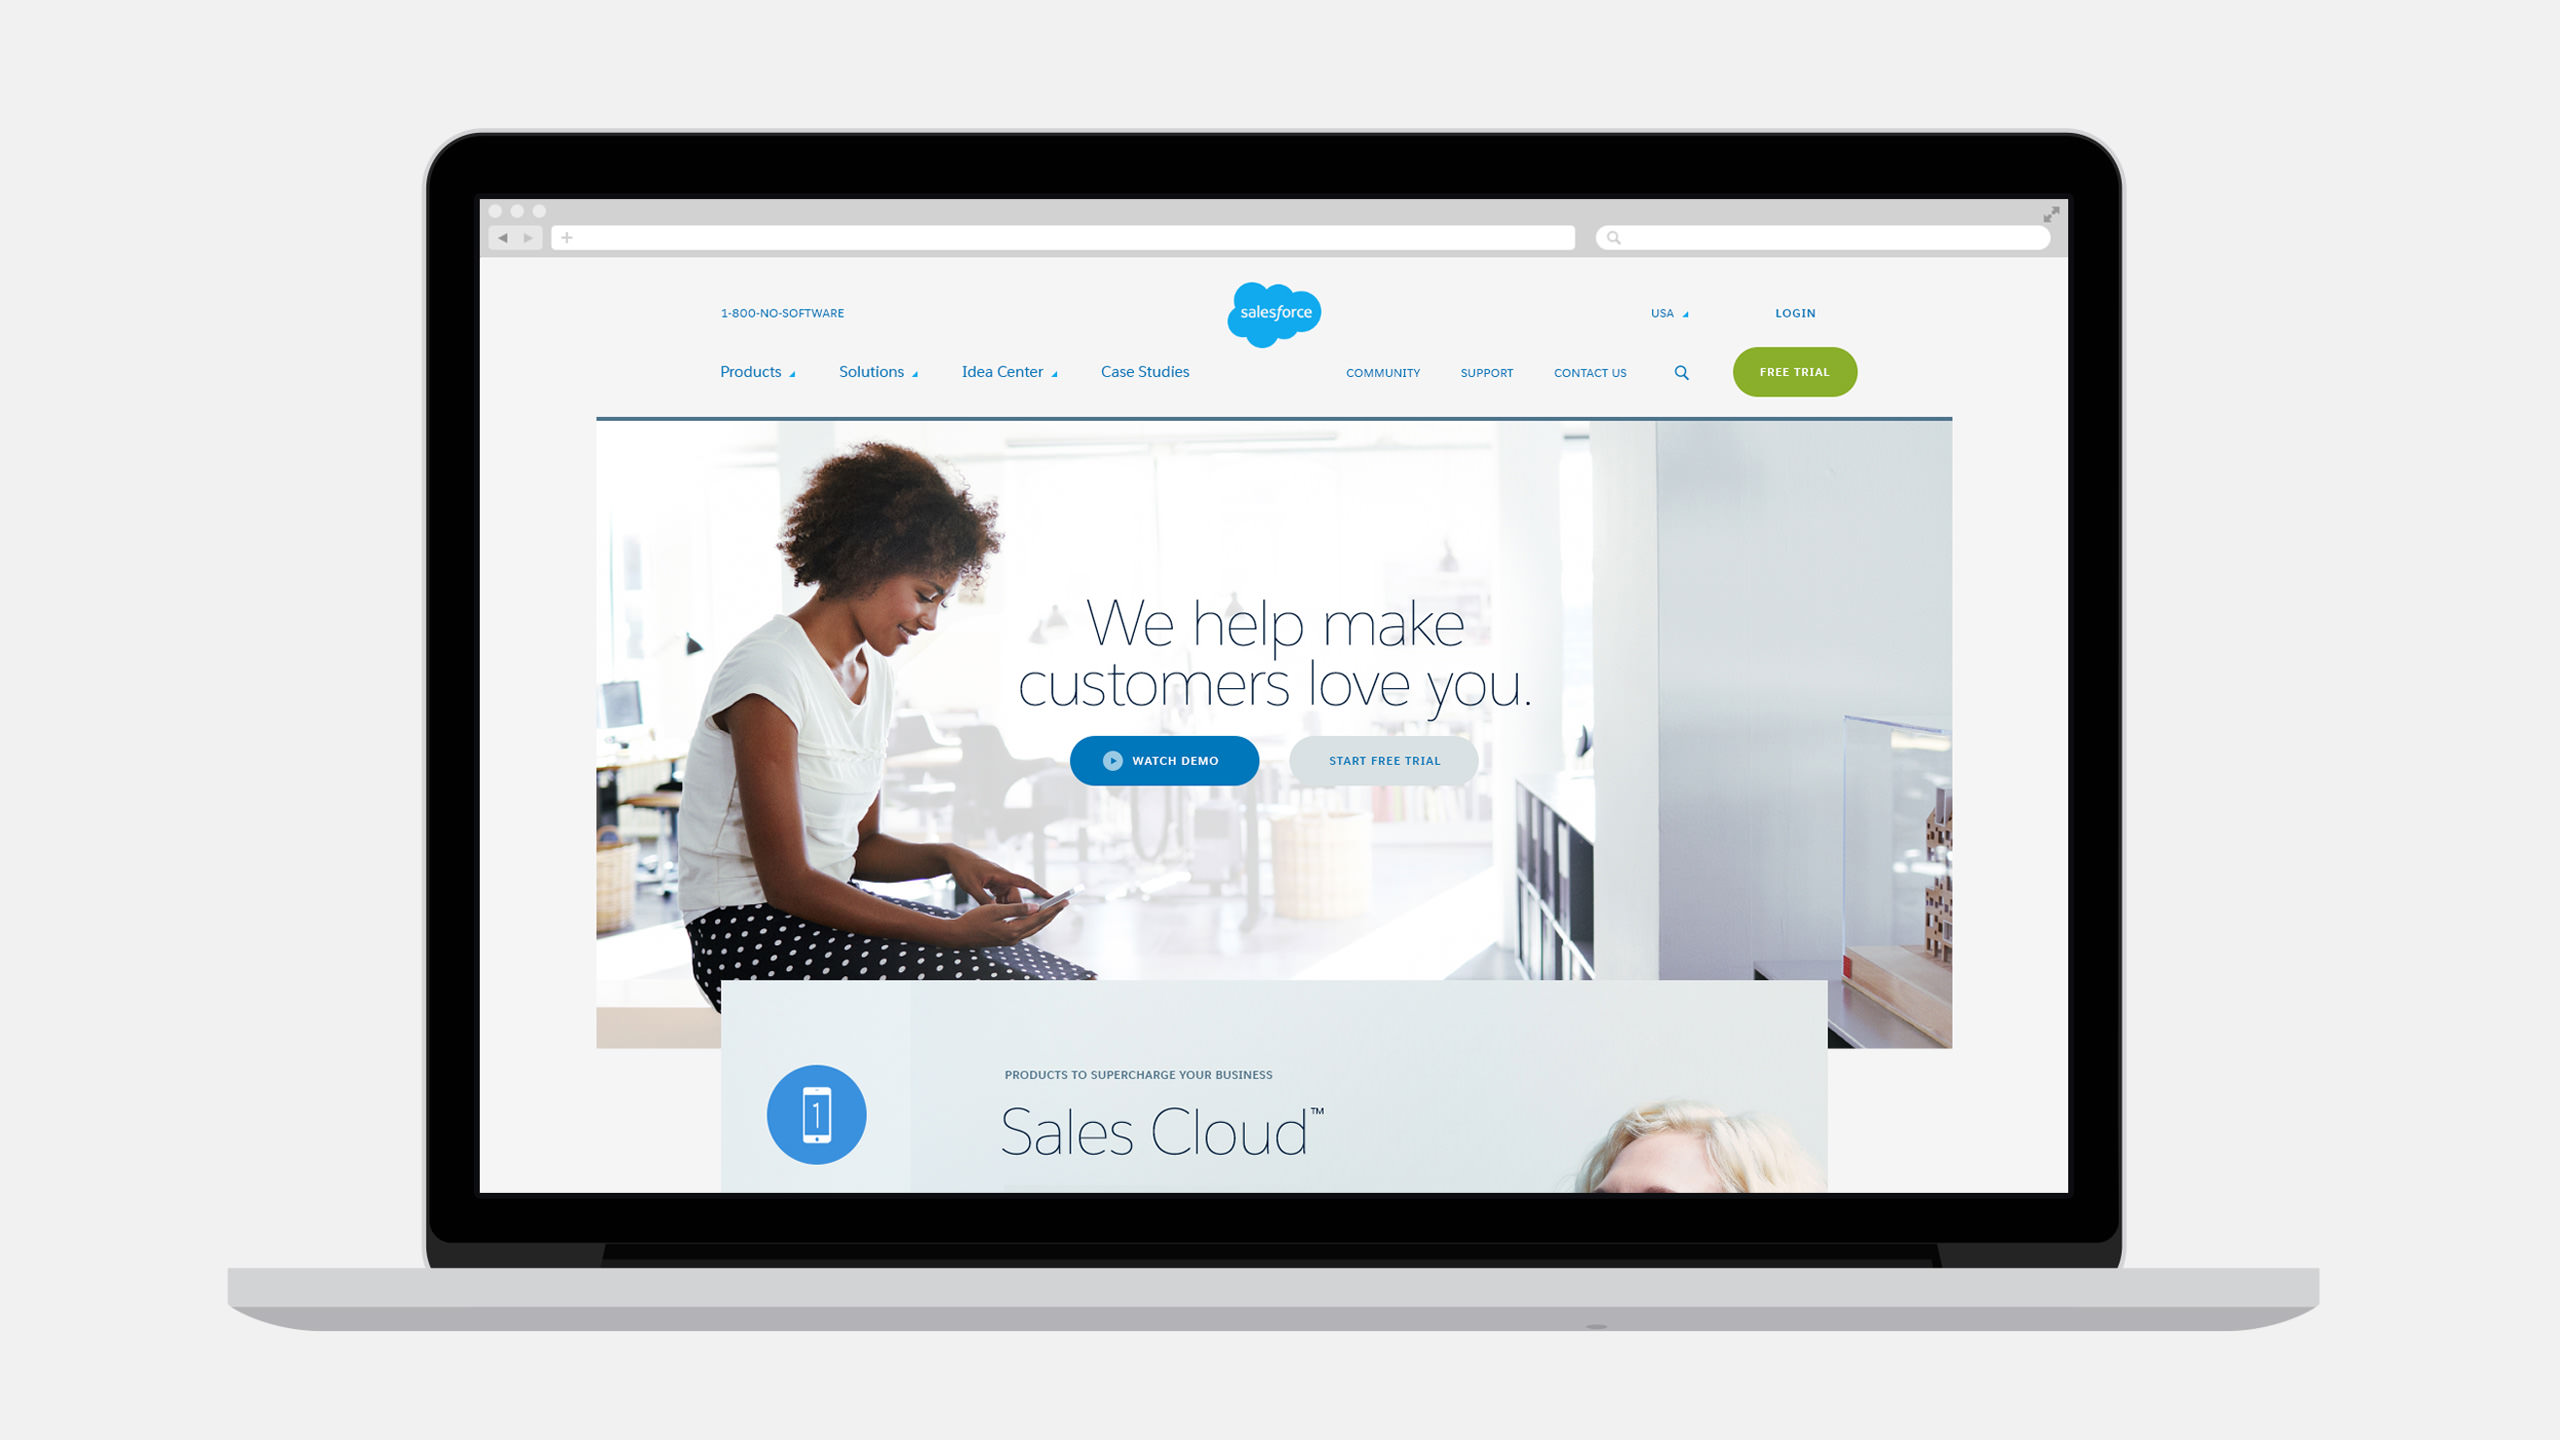 salesforce-brand-application-web-laptop